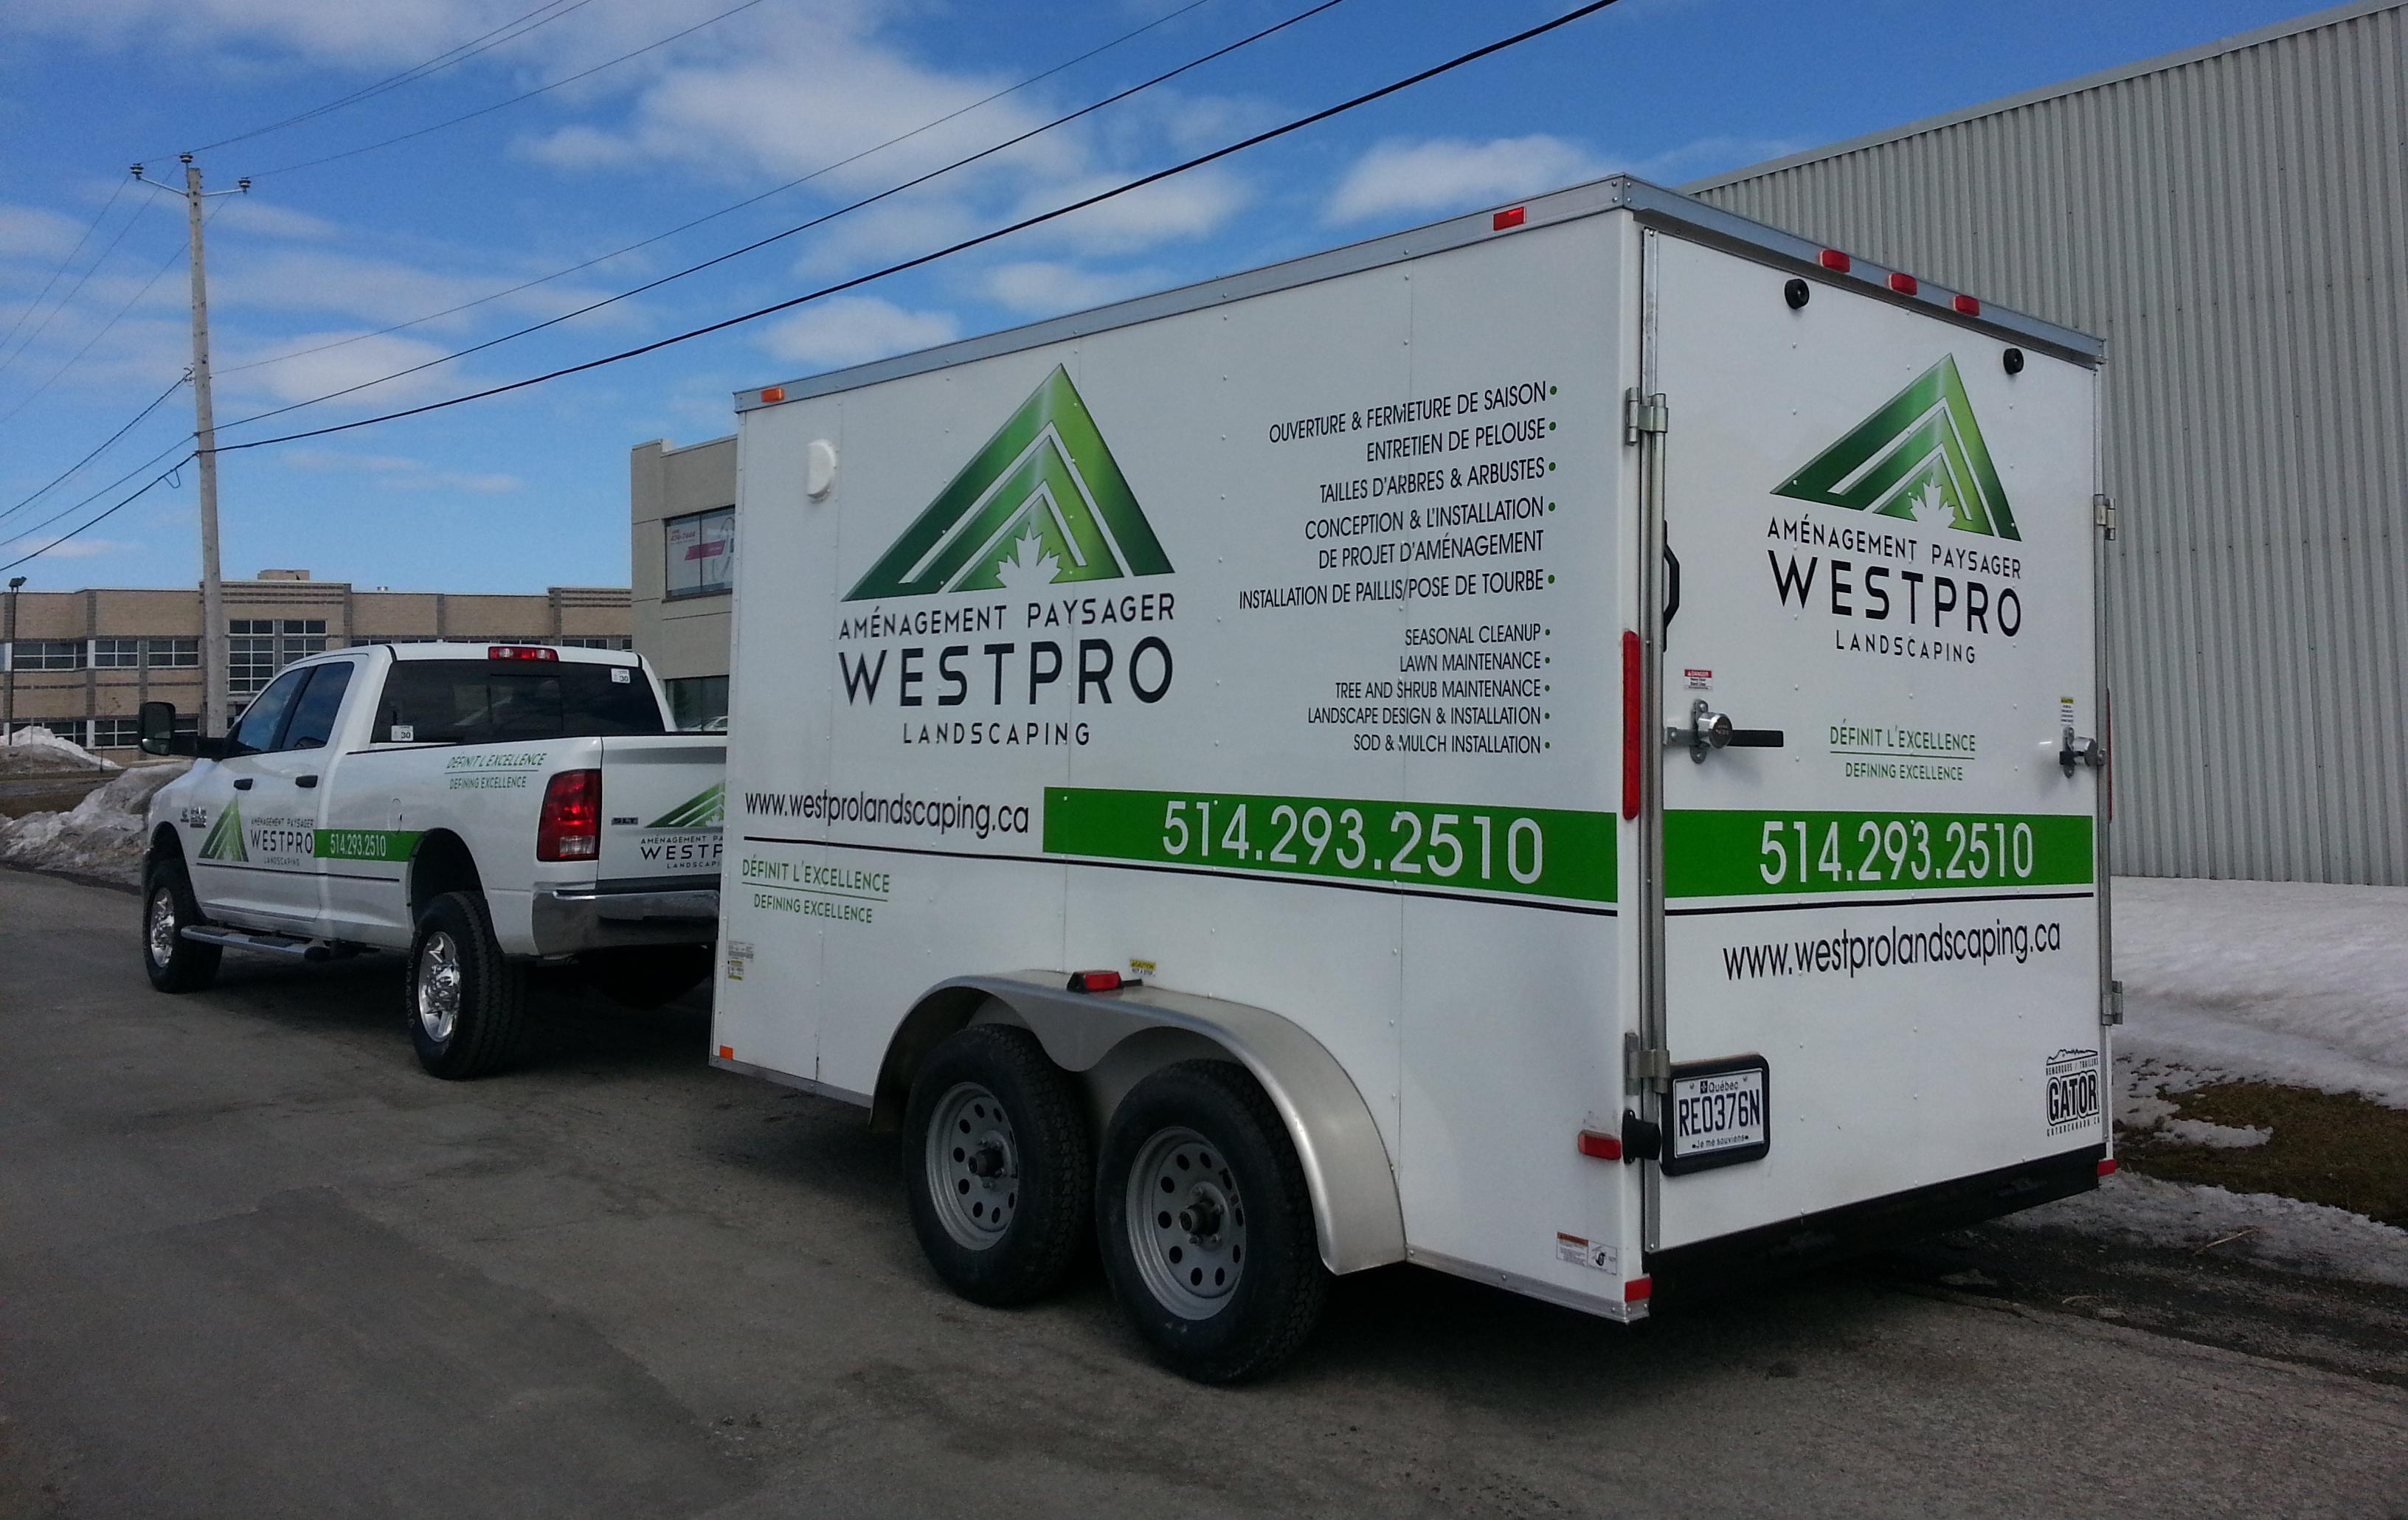 Vehicle Lettering - WestPro